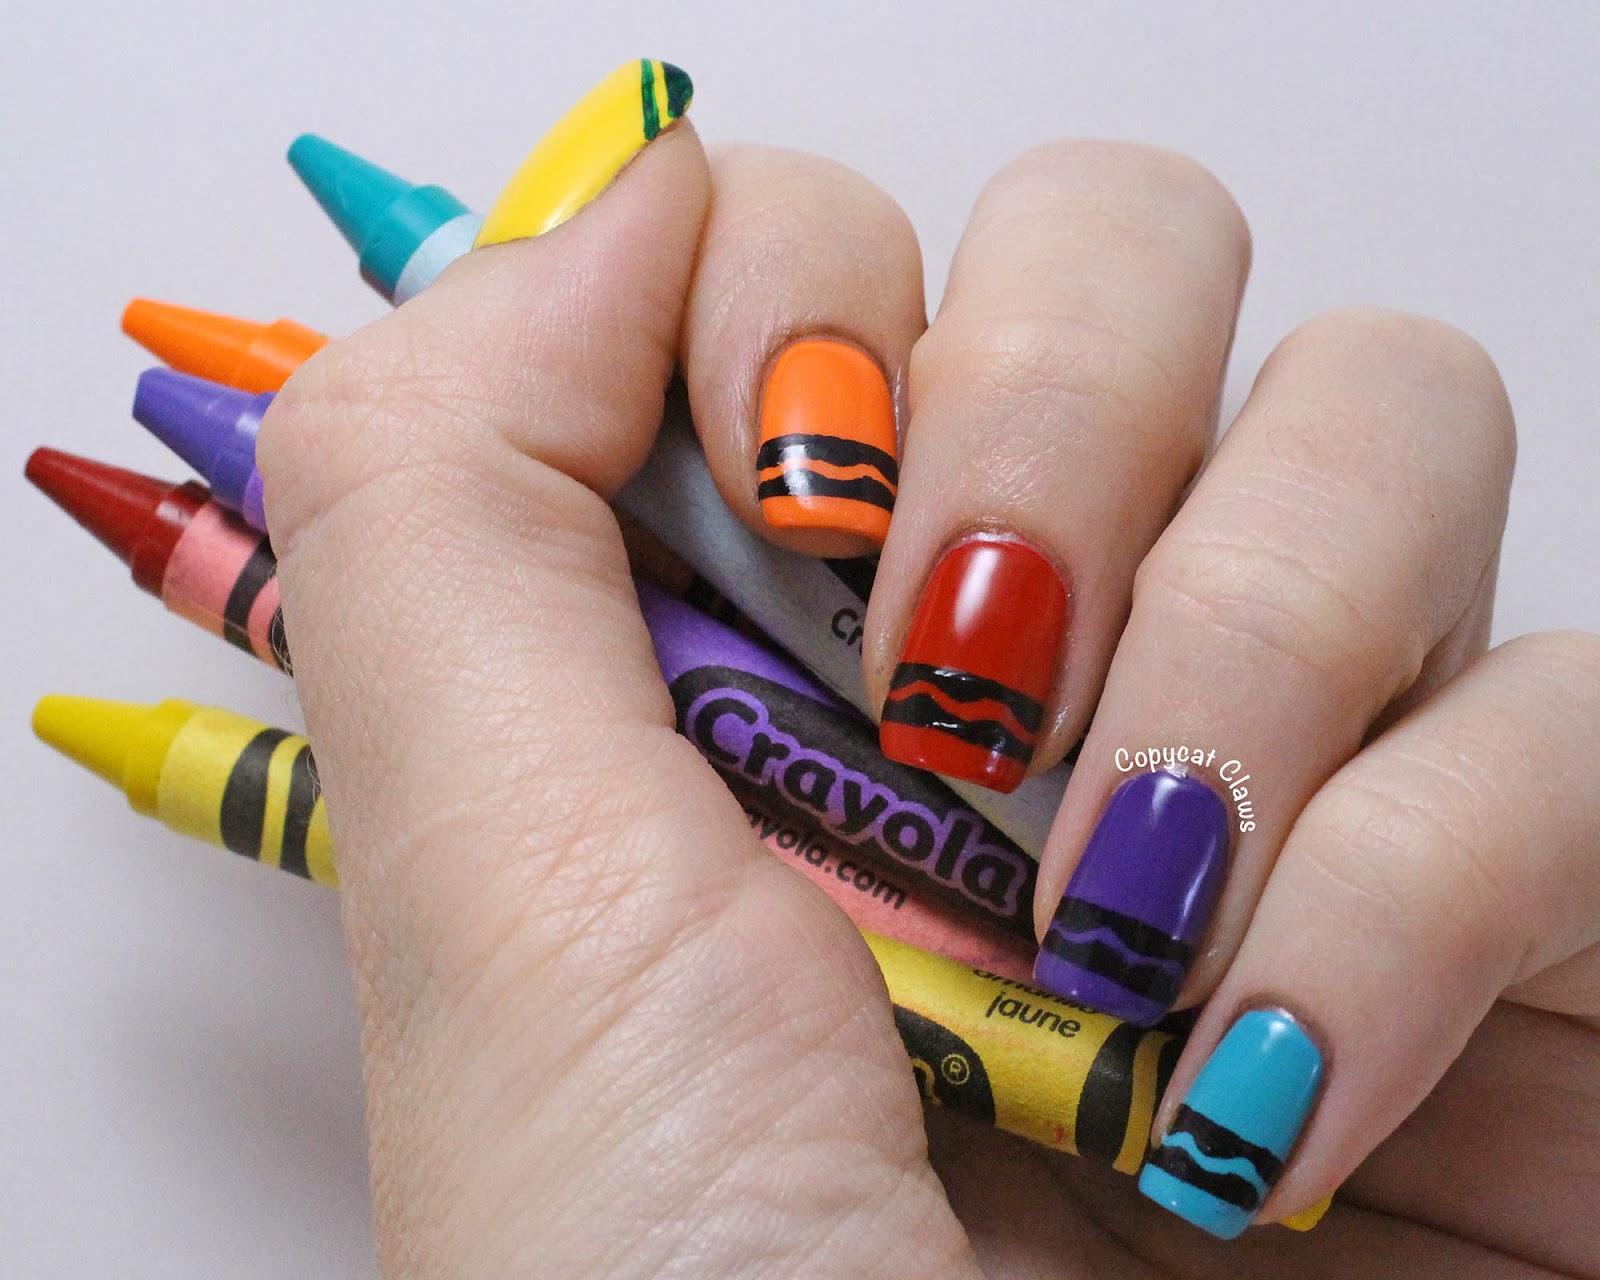 Nail art dotting tool set philippines summer nail designs 24 gorgeous nail art school slyburycom nail art school philippines prinsesfo Images